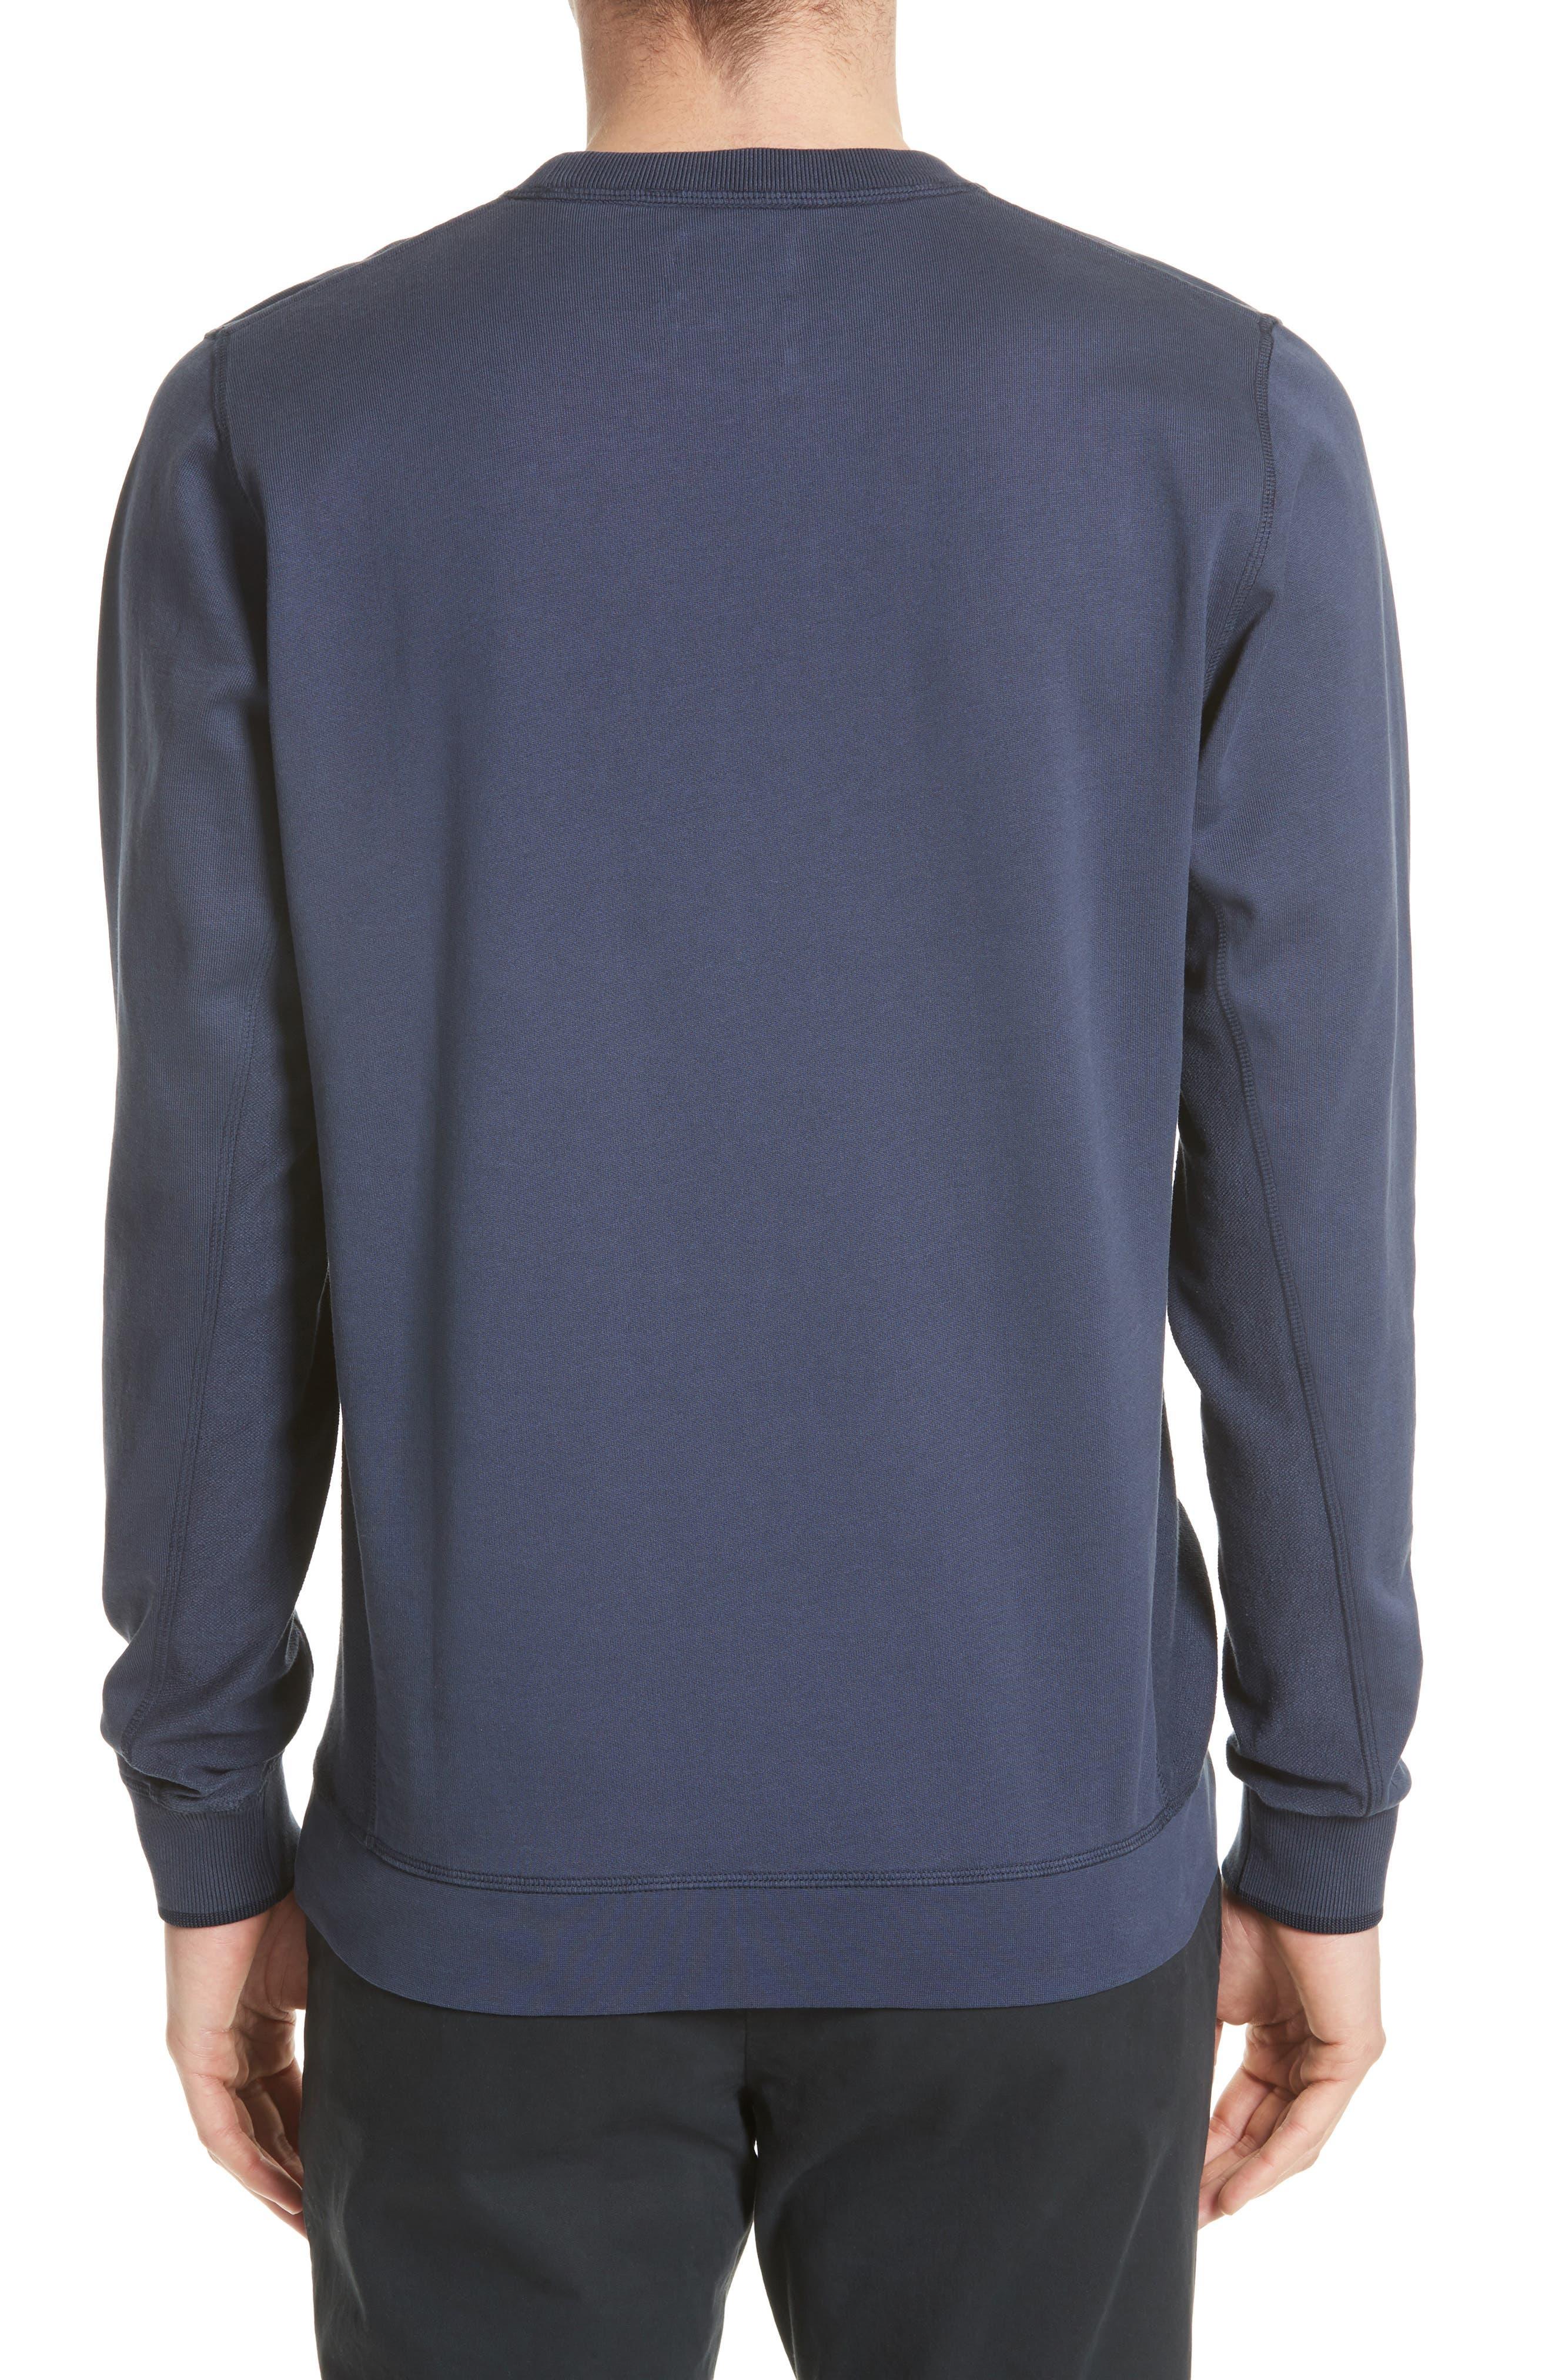 Vagn Mercerized Fleece Sweatshirt,                             Alternate thumbnail 2, color,                             401